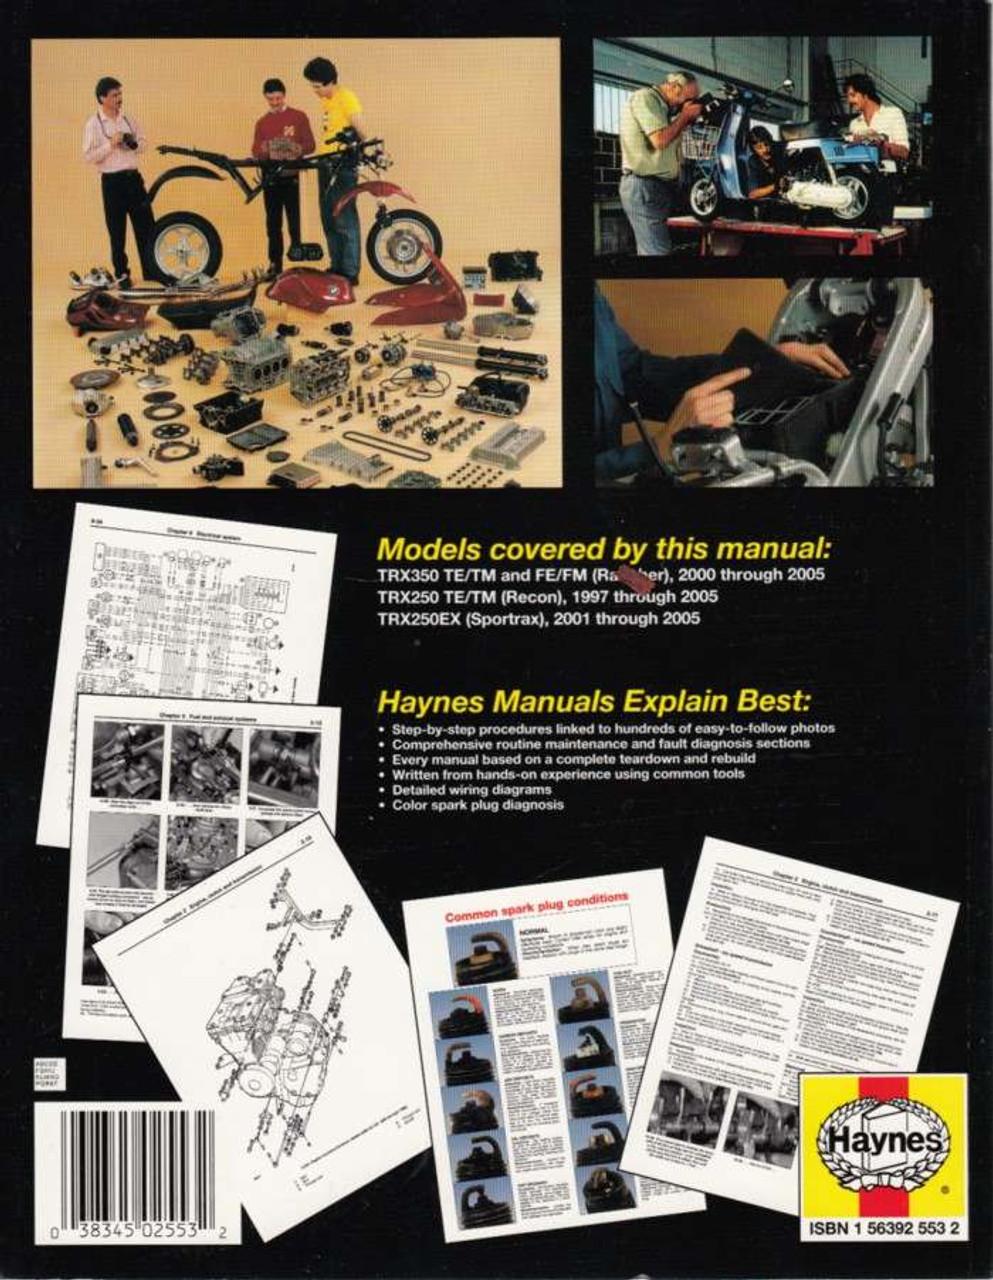 hight resolution of  honda trx350 rancher trx250 recon trx250ex sportrax atvs 1997 2005 workshop manual back